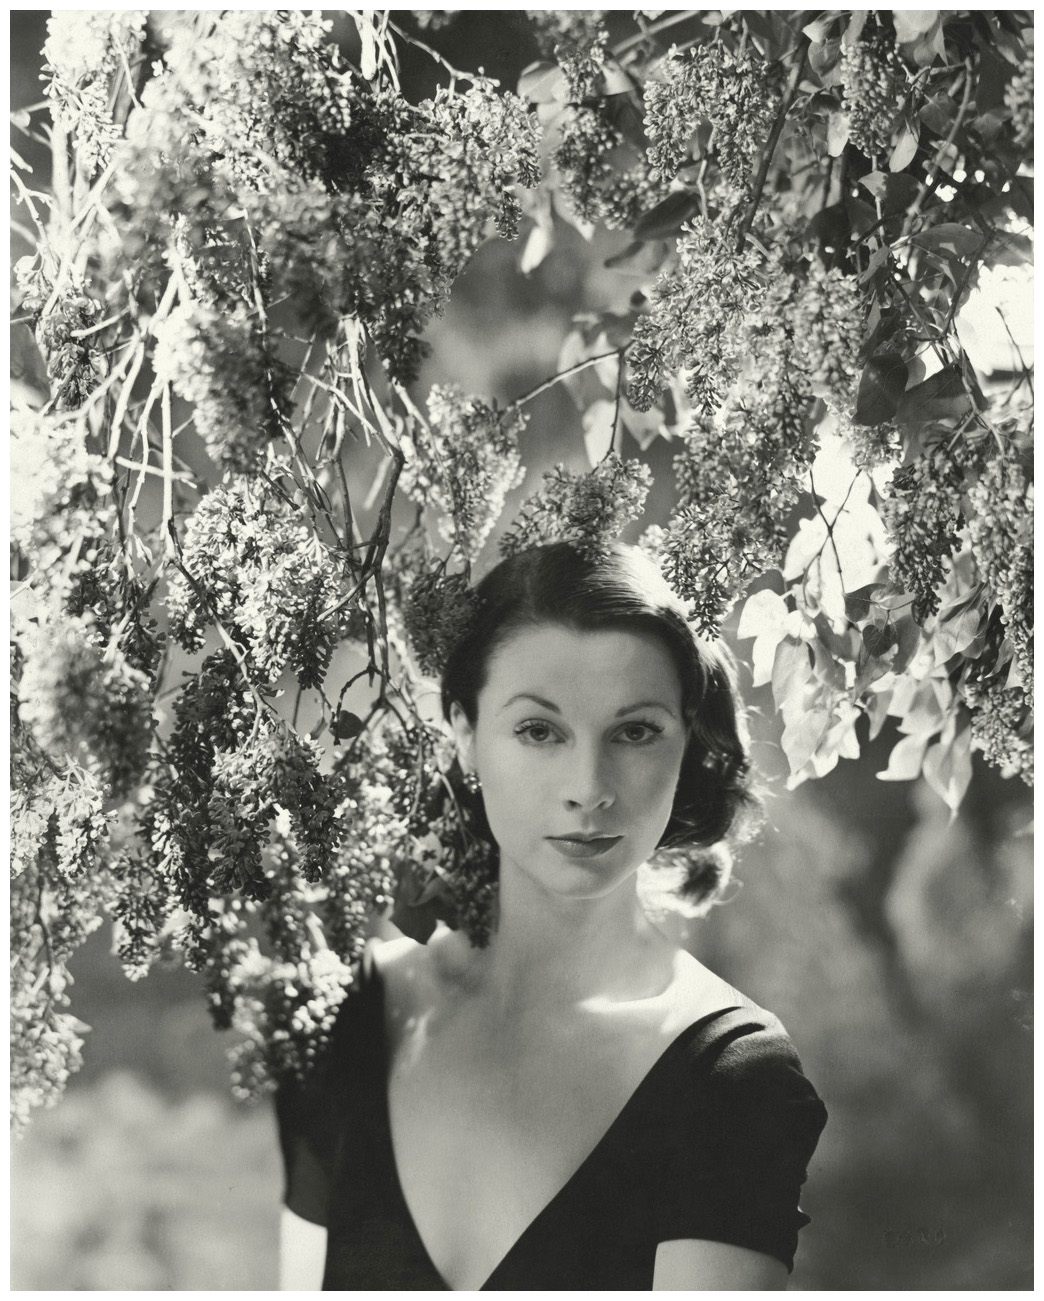 Mona Knox